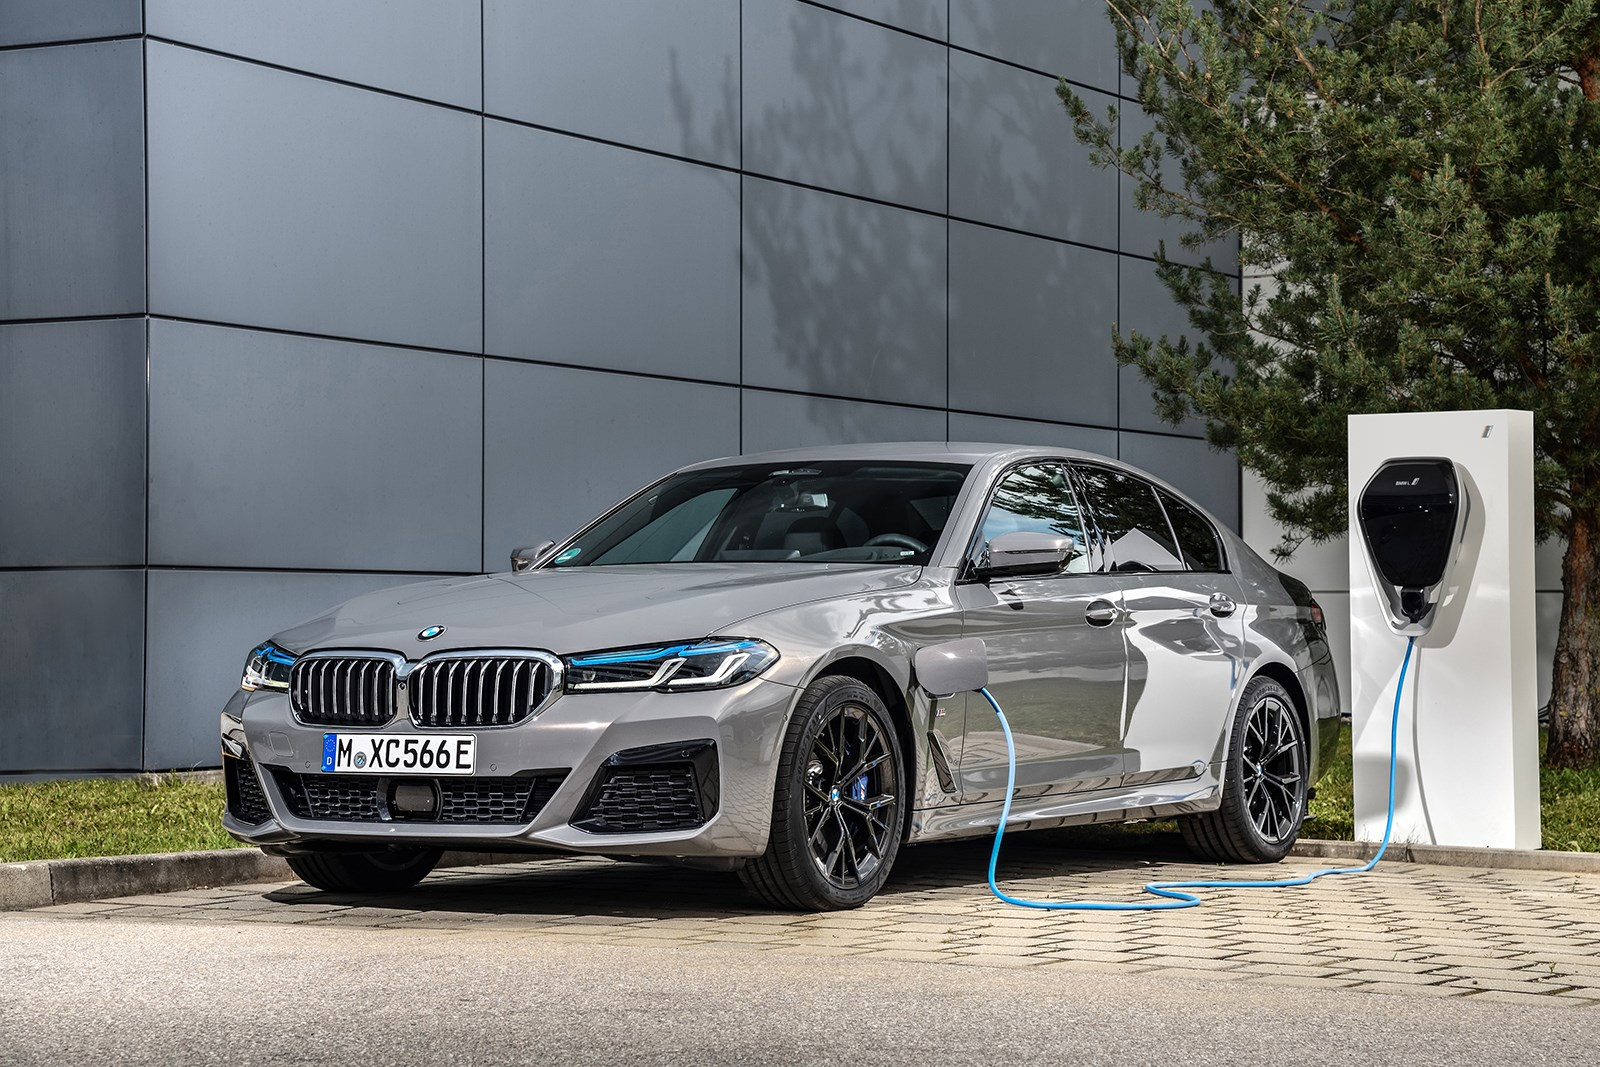 BMWが5シリーズのPHVにハイパワーな「545e」を追加。最高出力394hp、EV航続距離57km